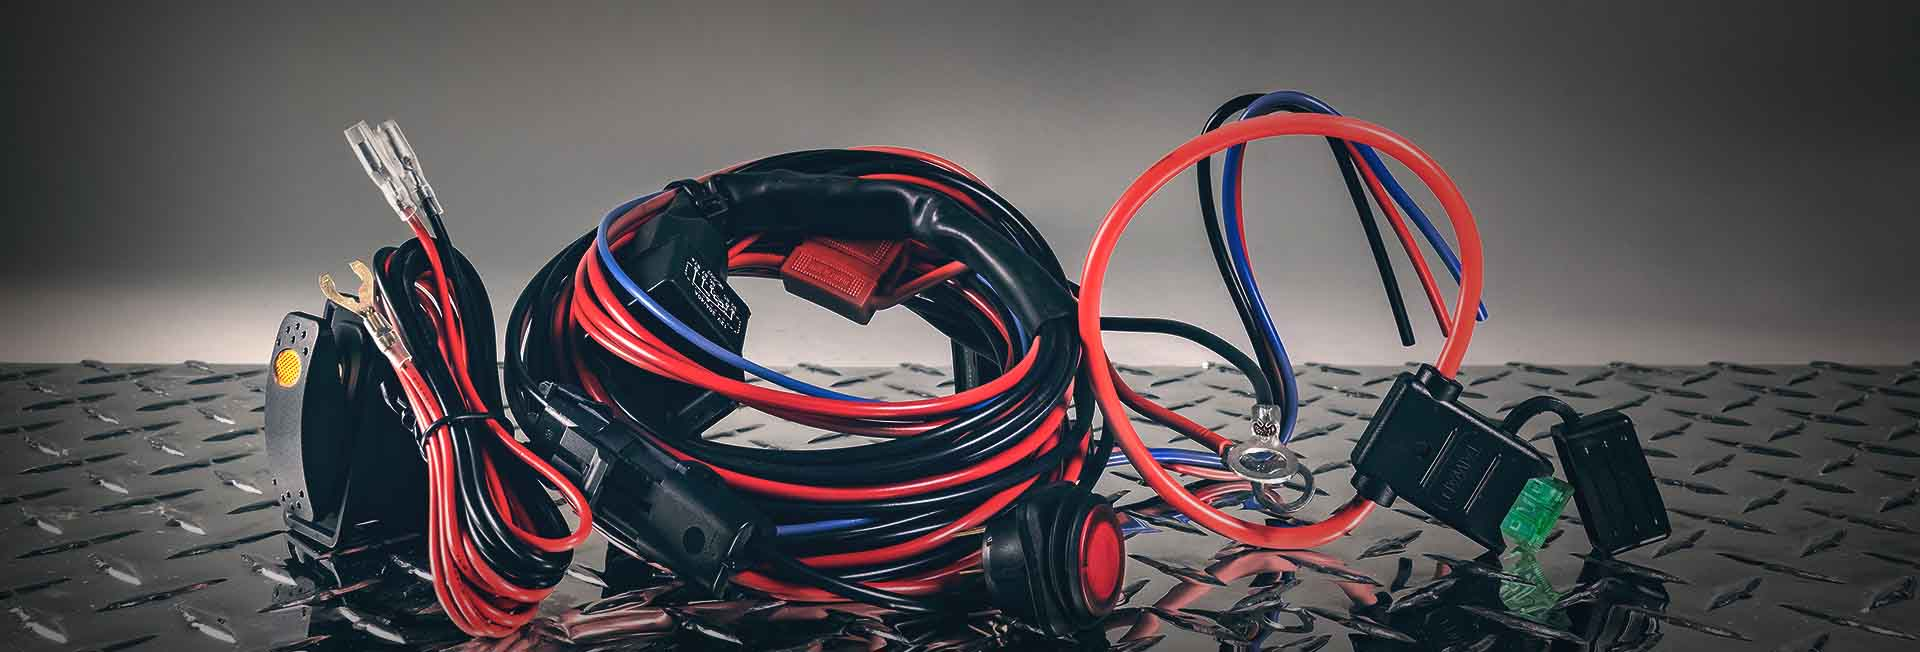 Led Wiring Harnesses Automotive Loom Tape Nz Harness